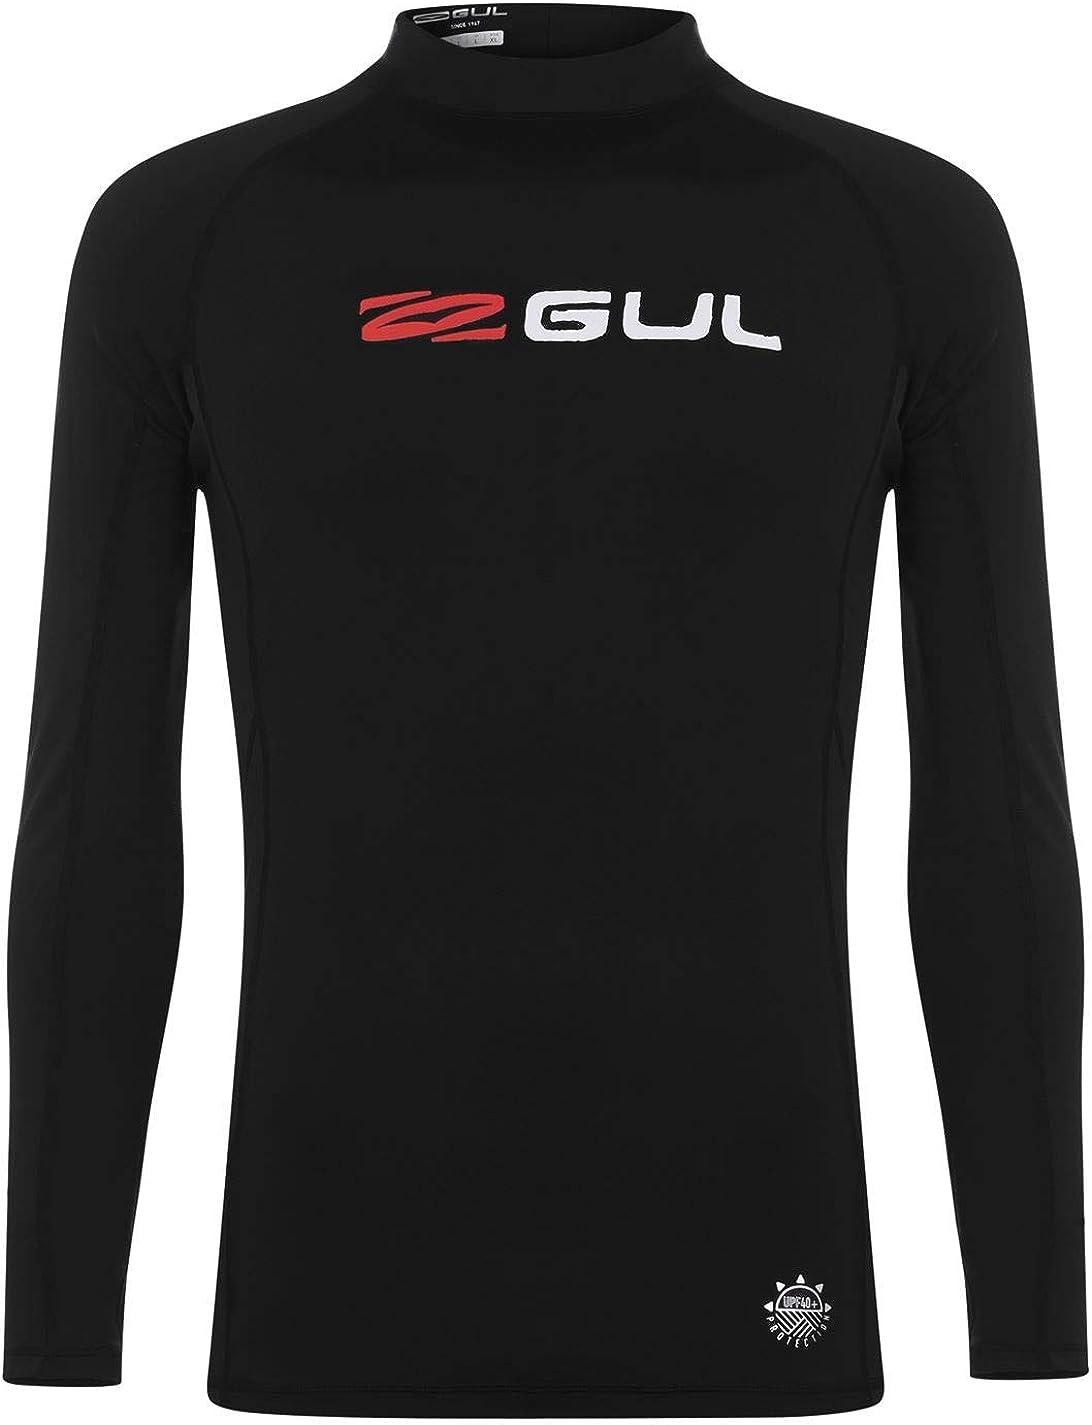 Gul Boys Long Sleeve Rash Vest Crew Neck Lightweight Swimming Beach Pool Top